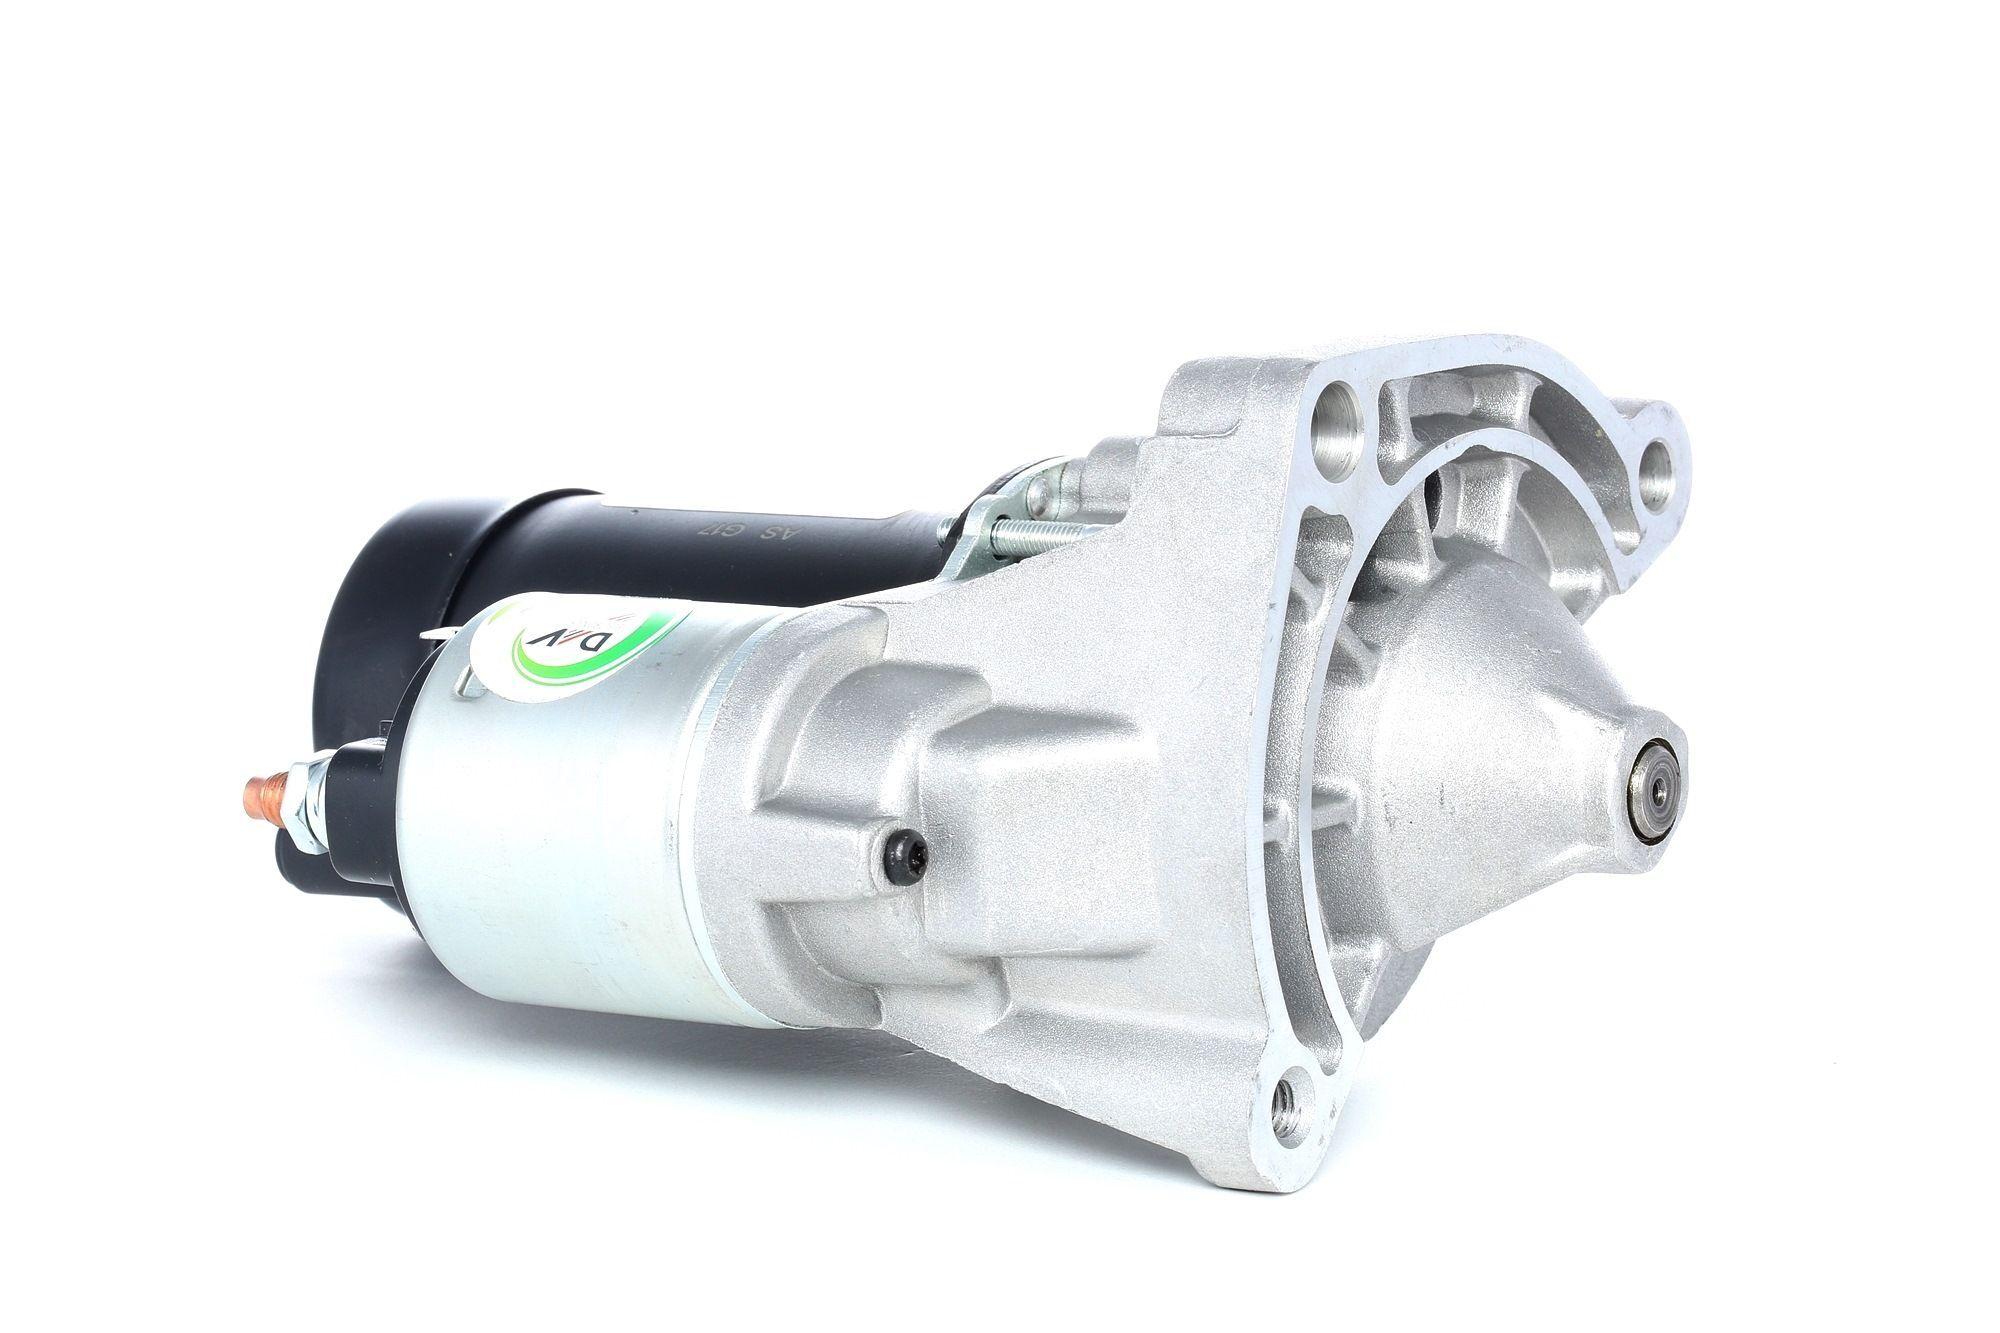 AS-PL Starttimoottori Brand new AS-PL Alternator regulator S3005 Startti,Käynnistinmoottori PEUGEOT,CITROËN,FIAT,206 Schrägheck 2A/C,206 CC 2D